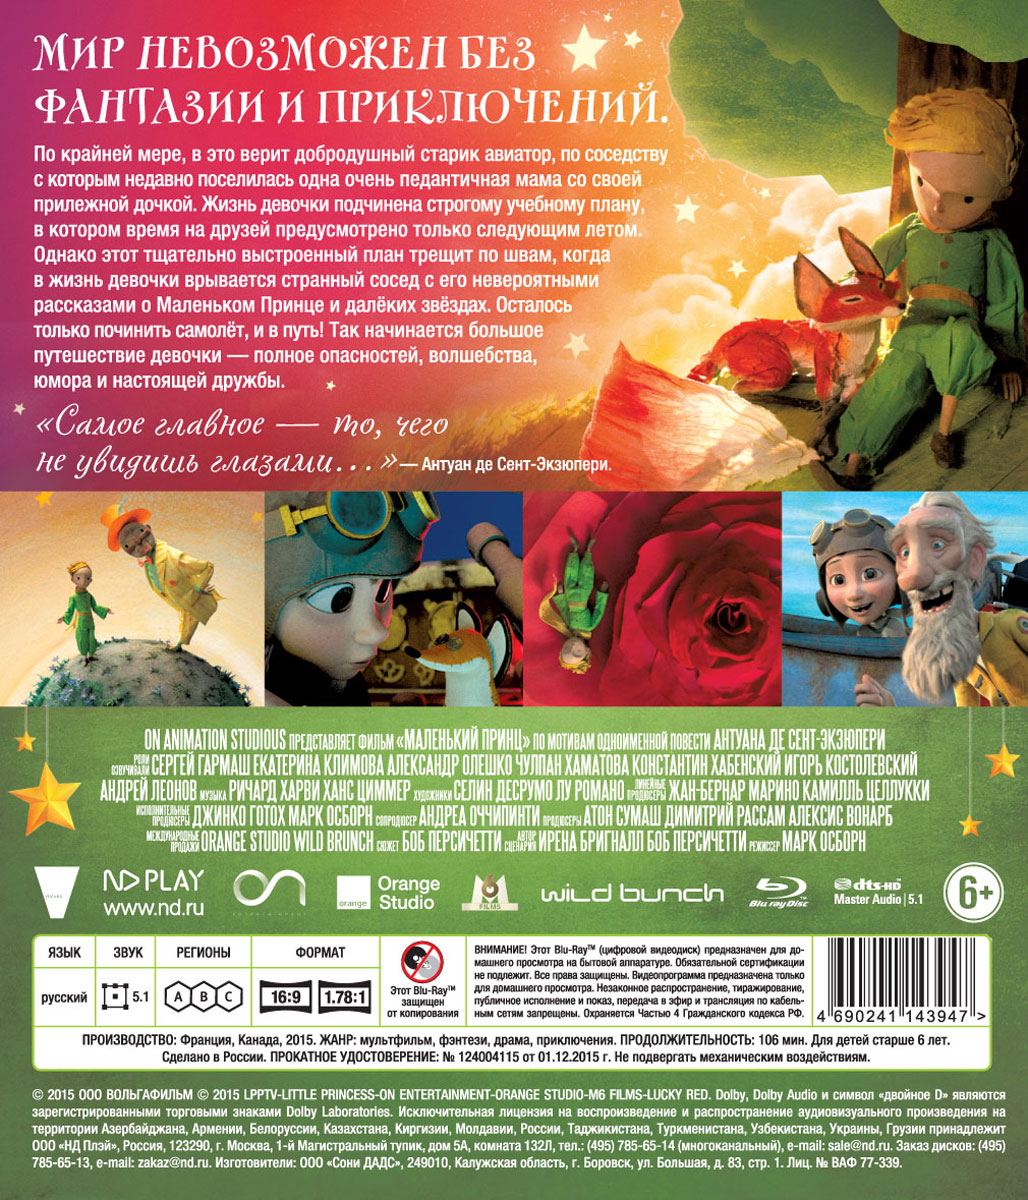 Маленький принц (Blu-ray) Kaibou Productions,LPPTV,M6 Films,ON Animation Studios,On Entertainment,Onyx Films,Paramount Animation,TouTenKartoon